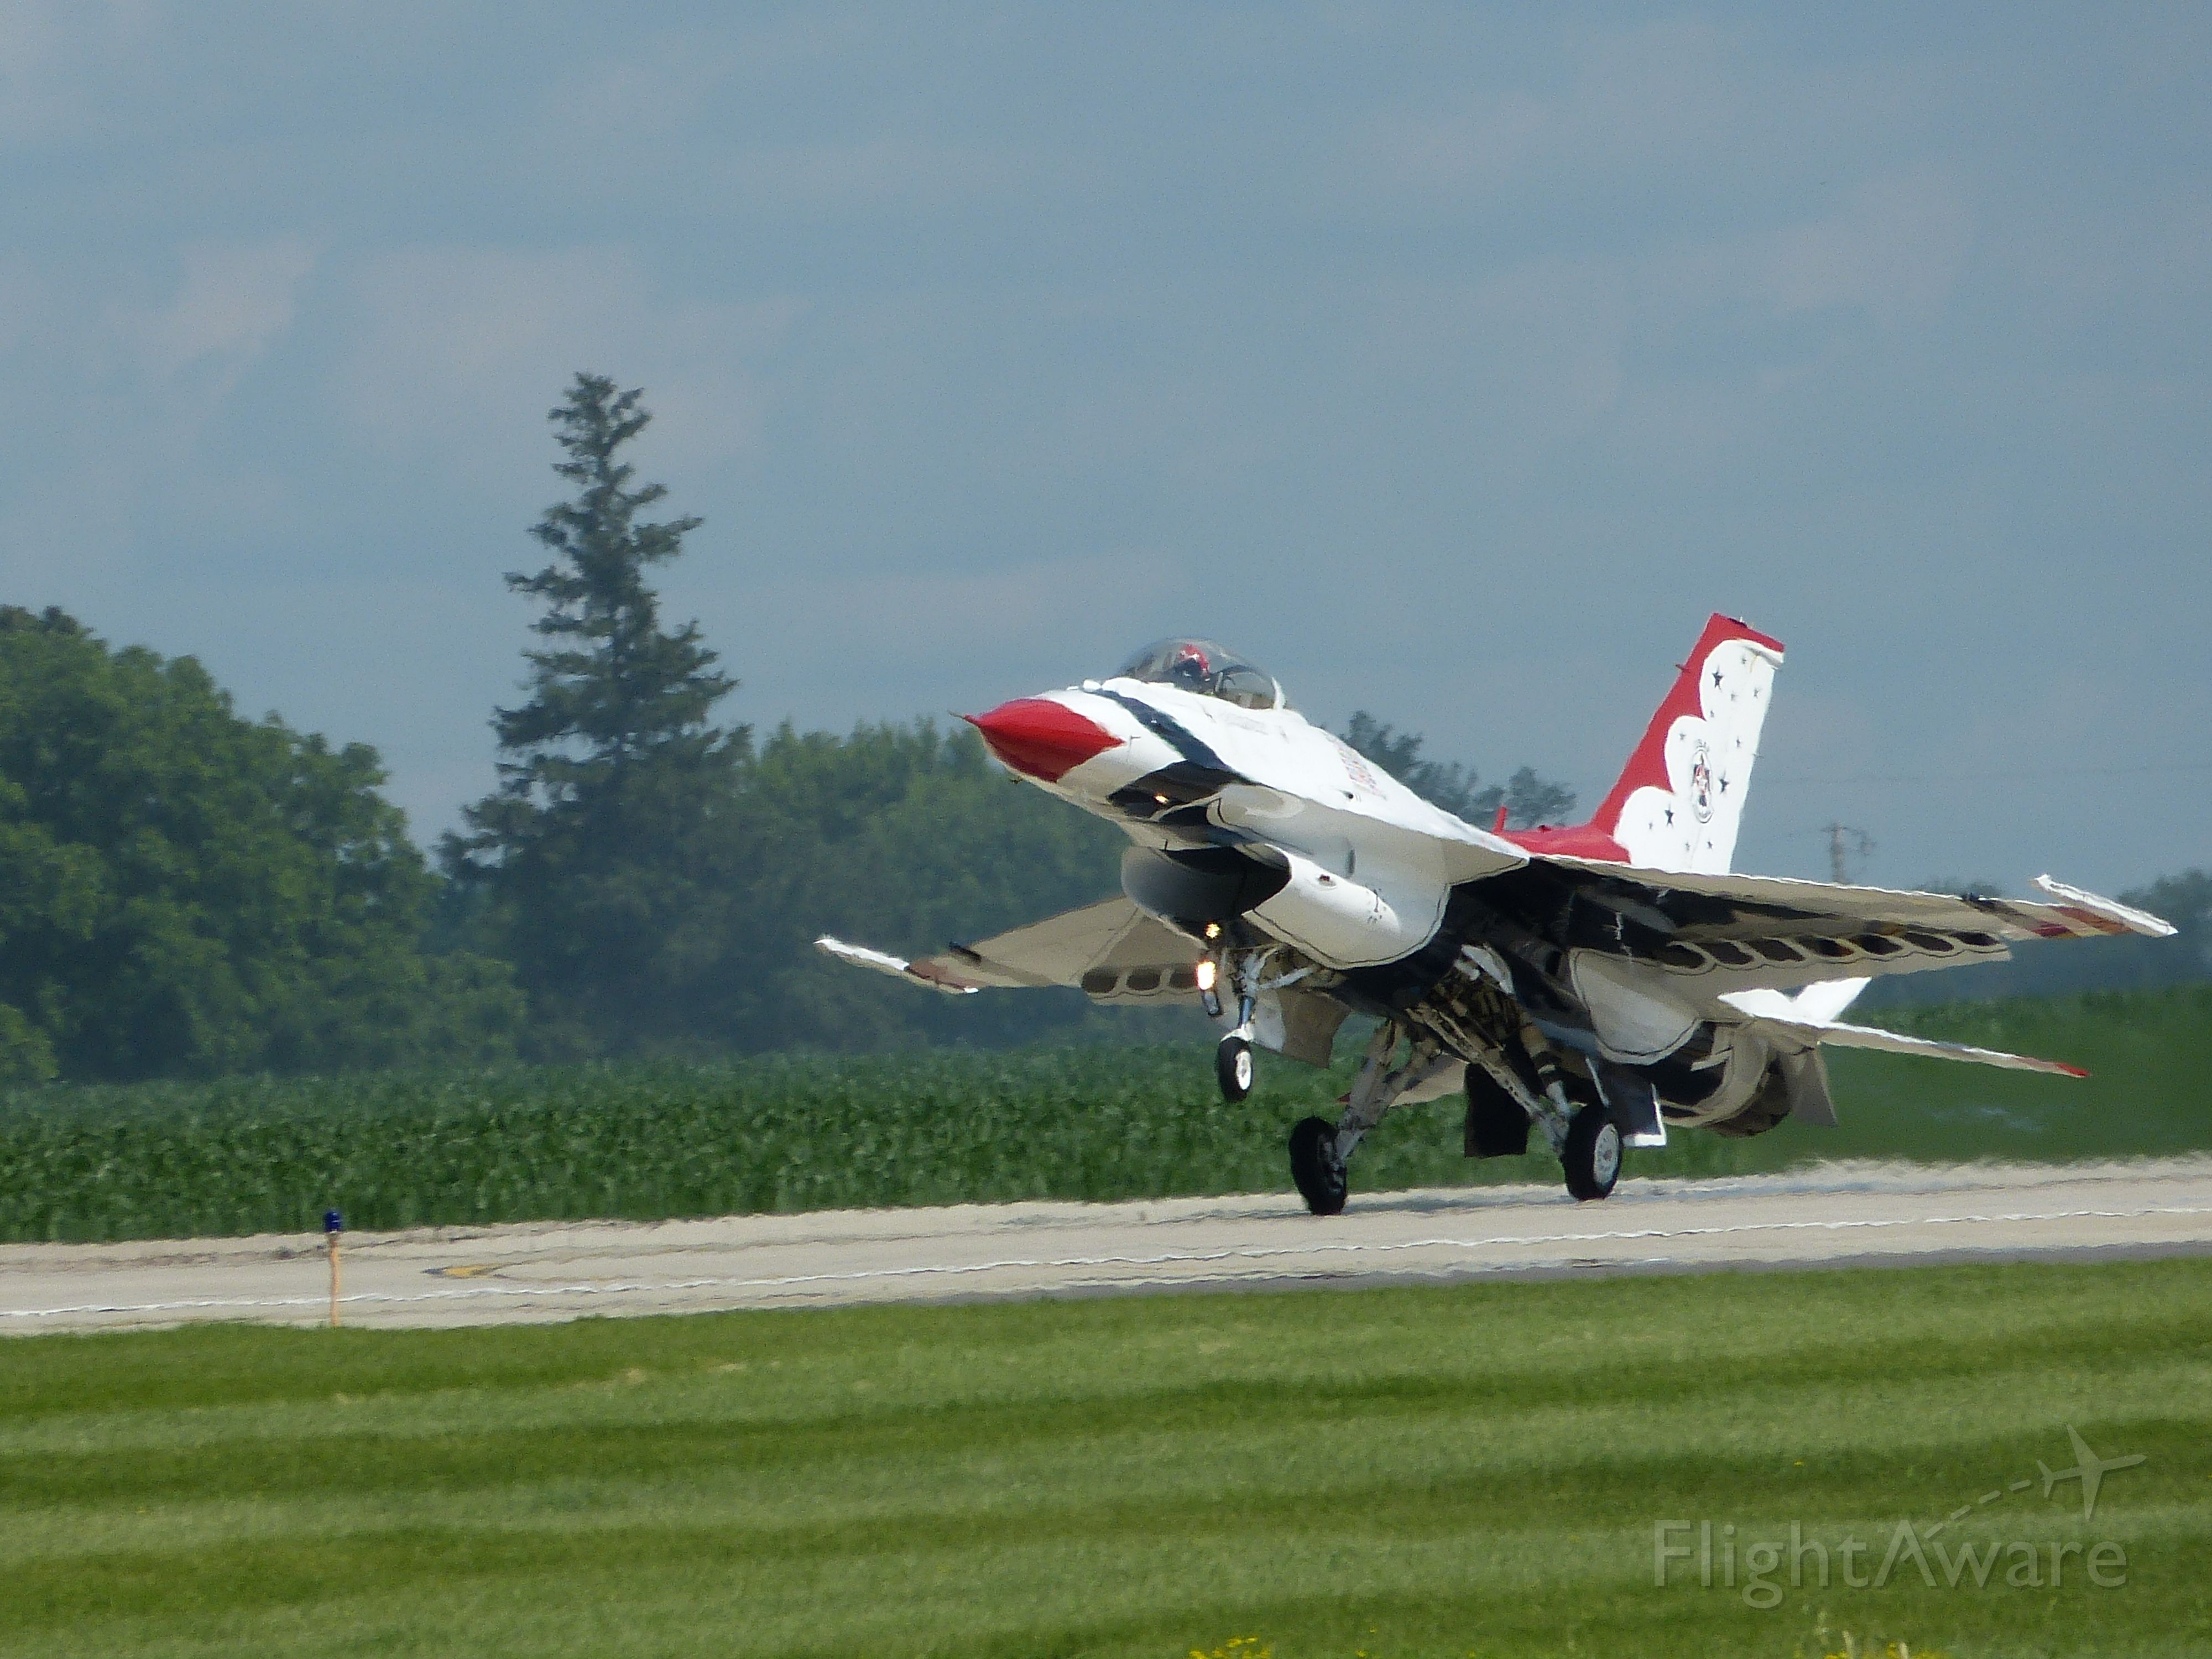 Lockheed F-16 Fighting Falcon (TBIRD1) - Touchdown! Mankato MN. June 28, 2015